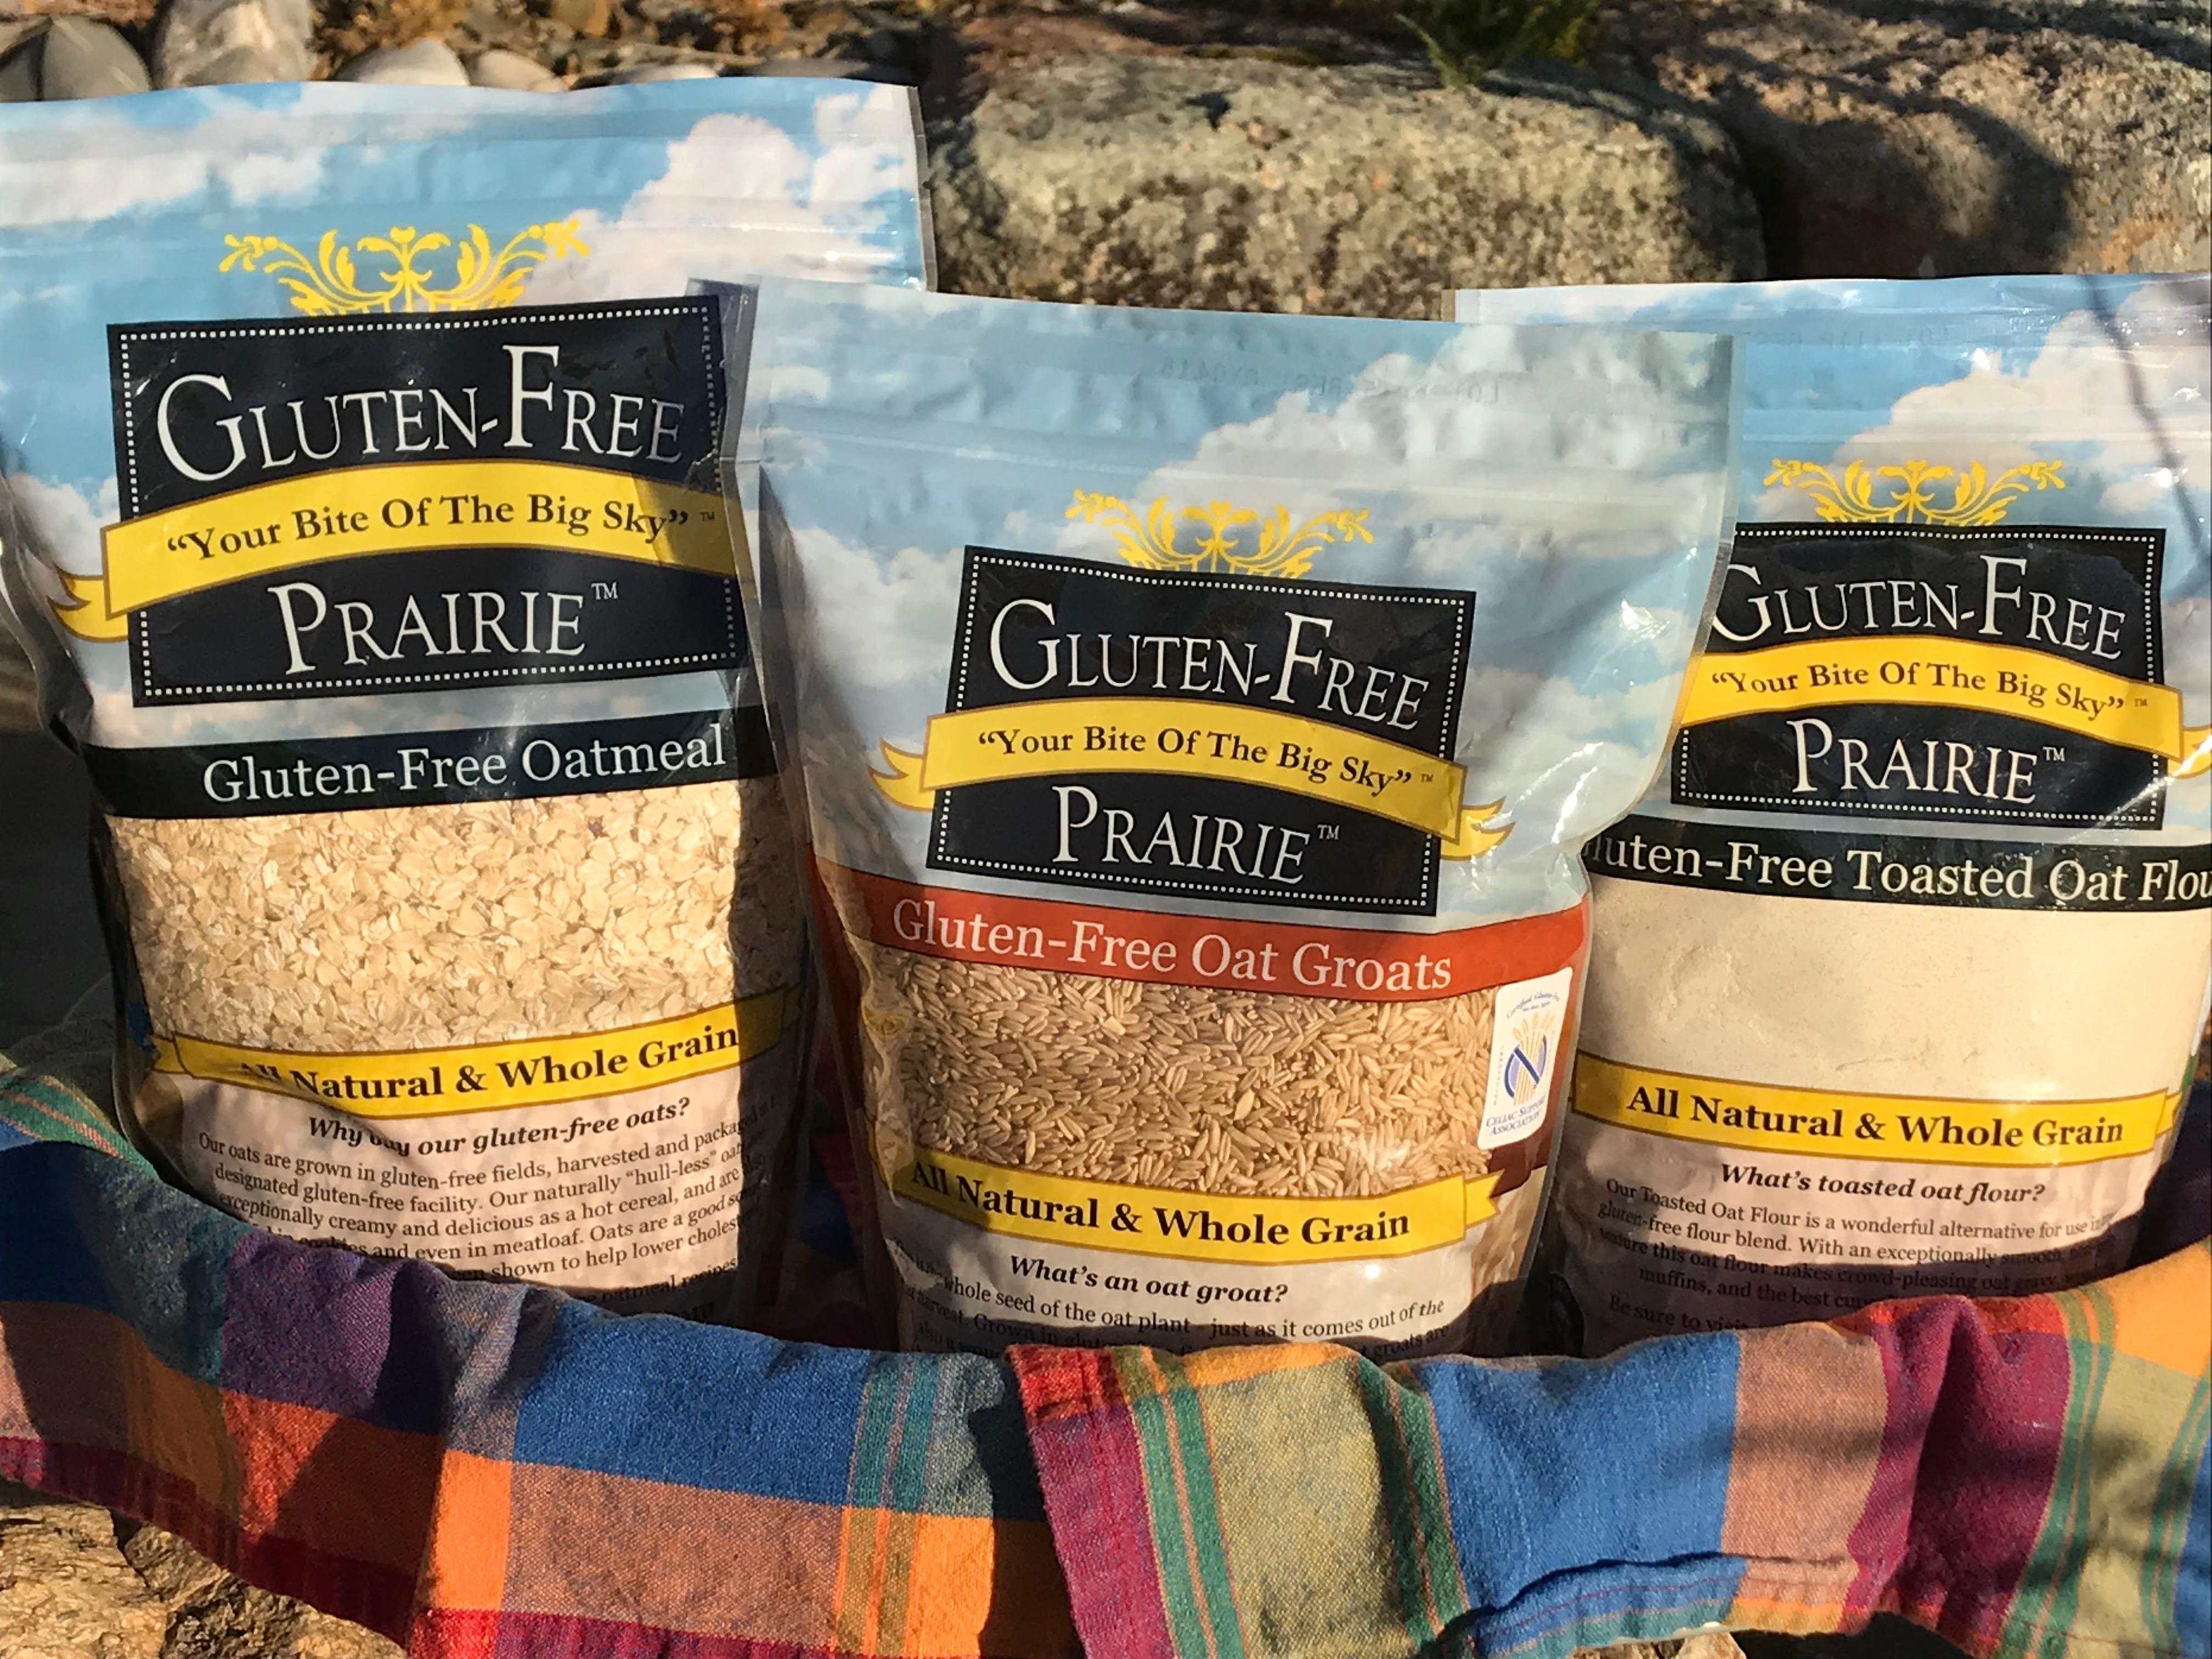 Gluten-Free Prairie Oatmeal Archives - Gluten-Free Prairie